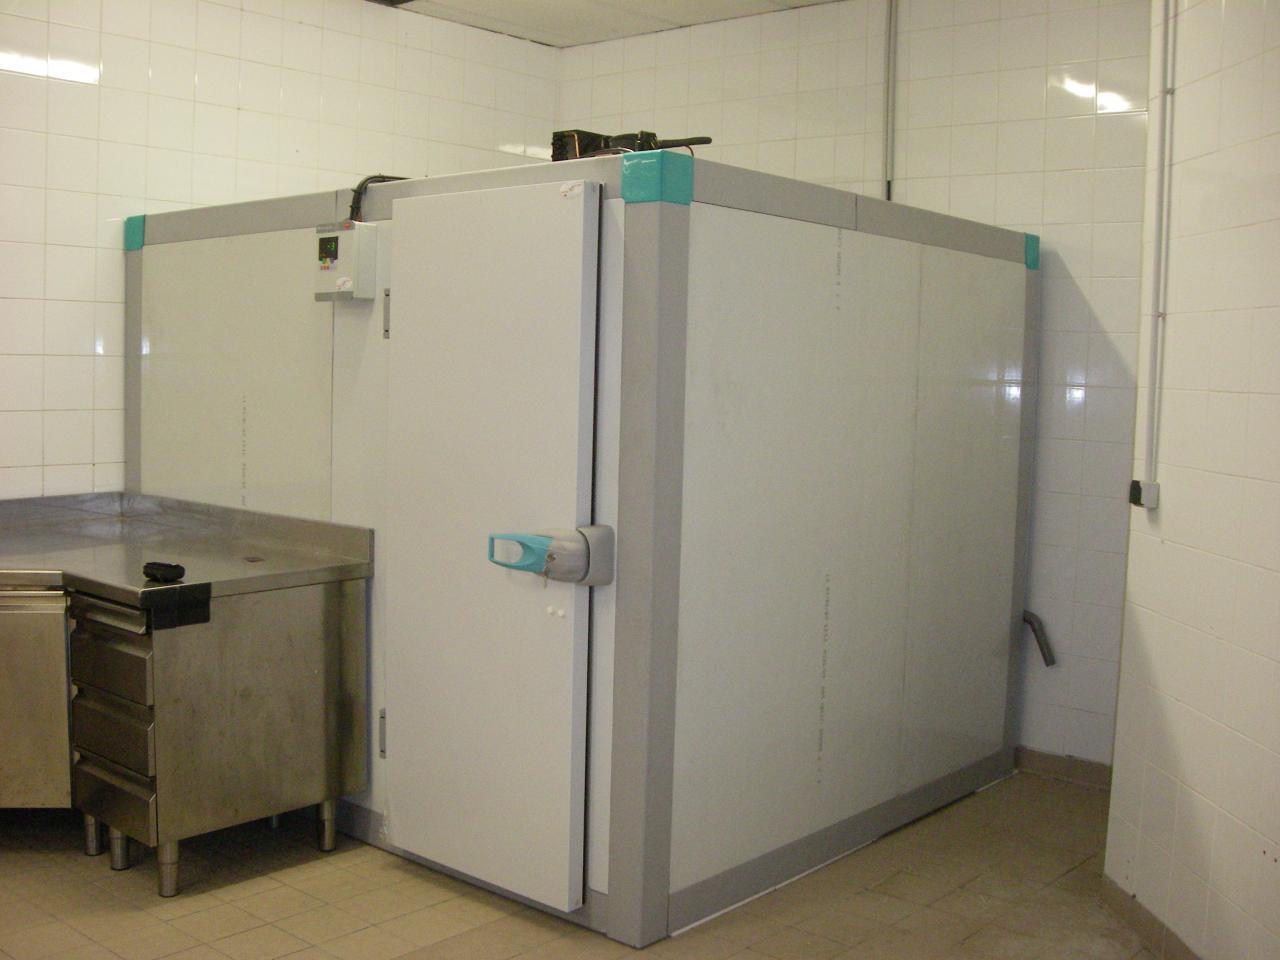 Chambre froide : Acheter  un système frigorifique